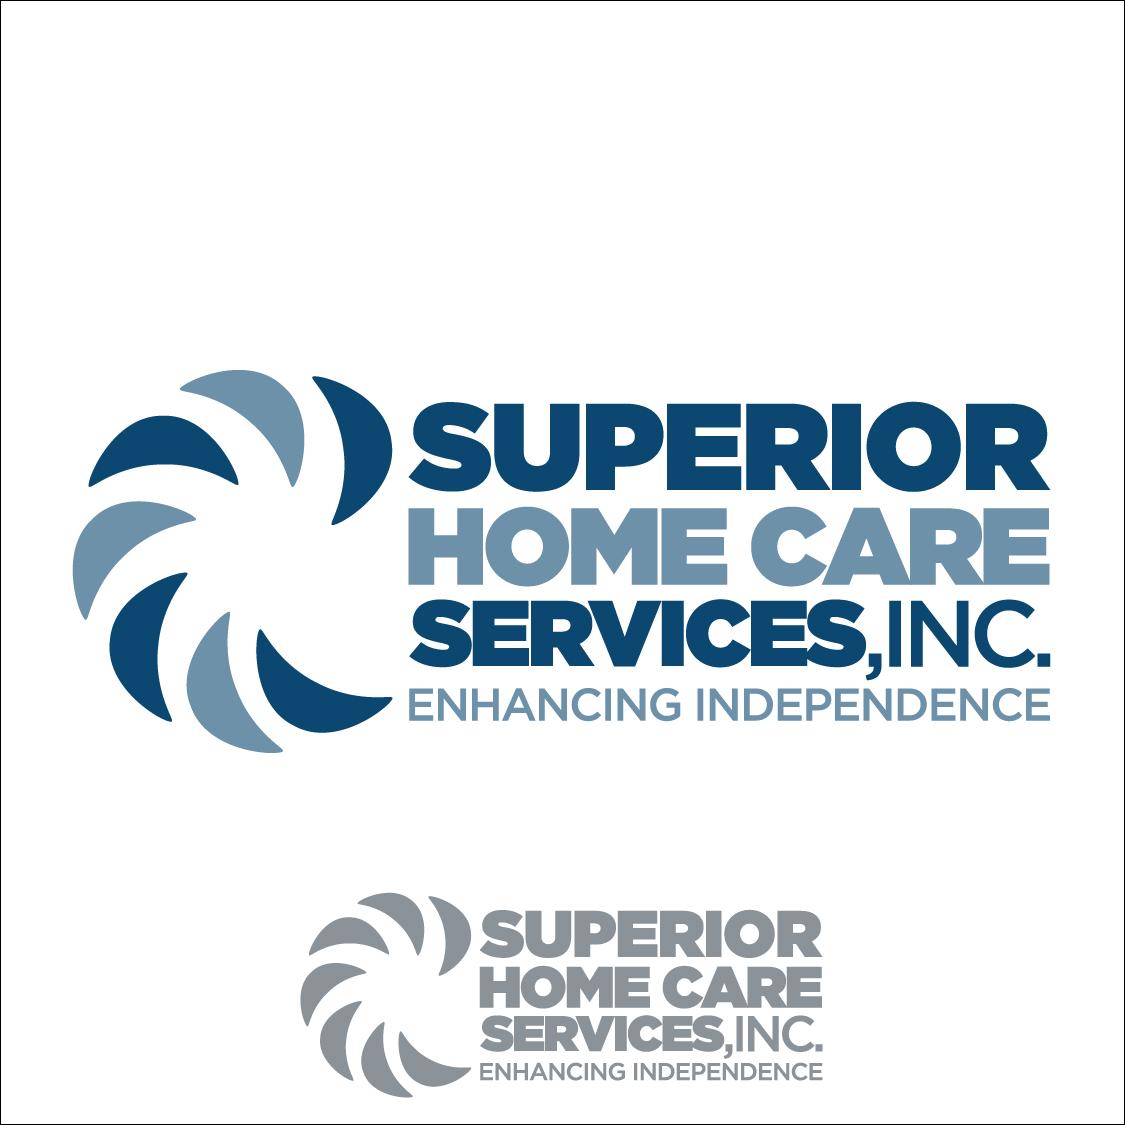 Professional elegant logo design for carole lindsey by fanolj ademi design 897228 - Home health care logo design ...